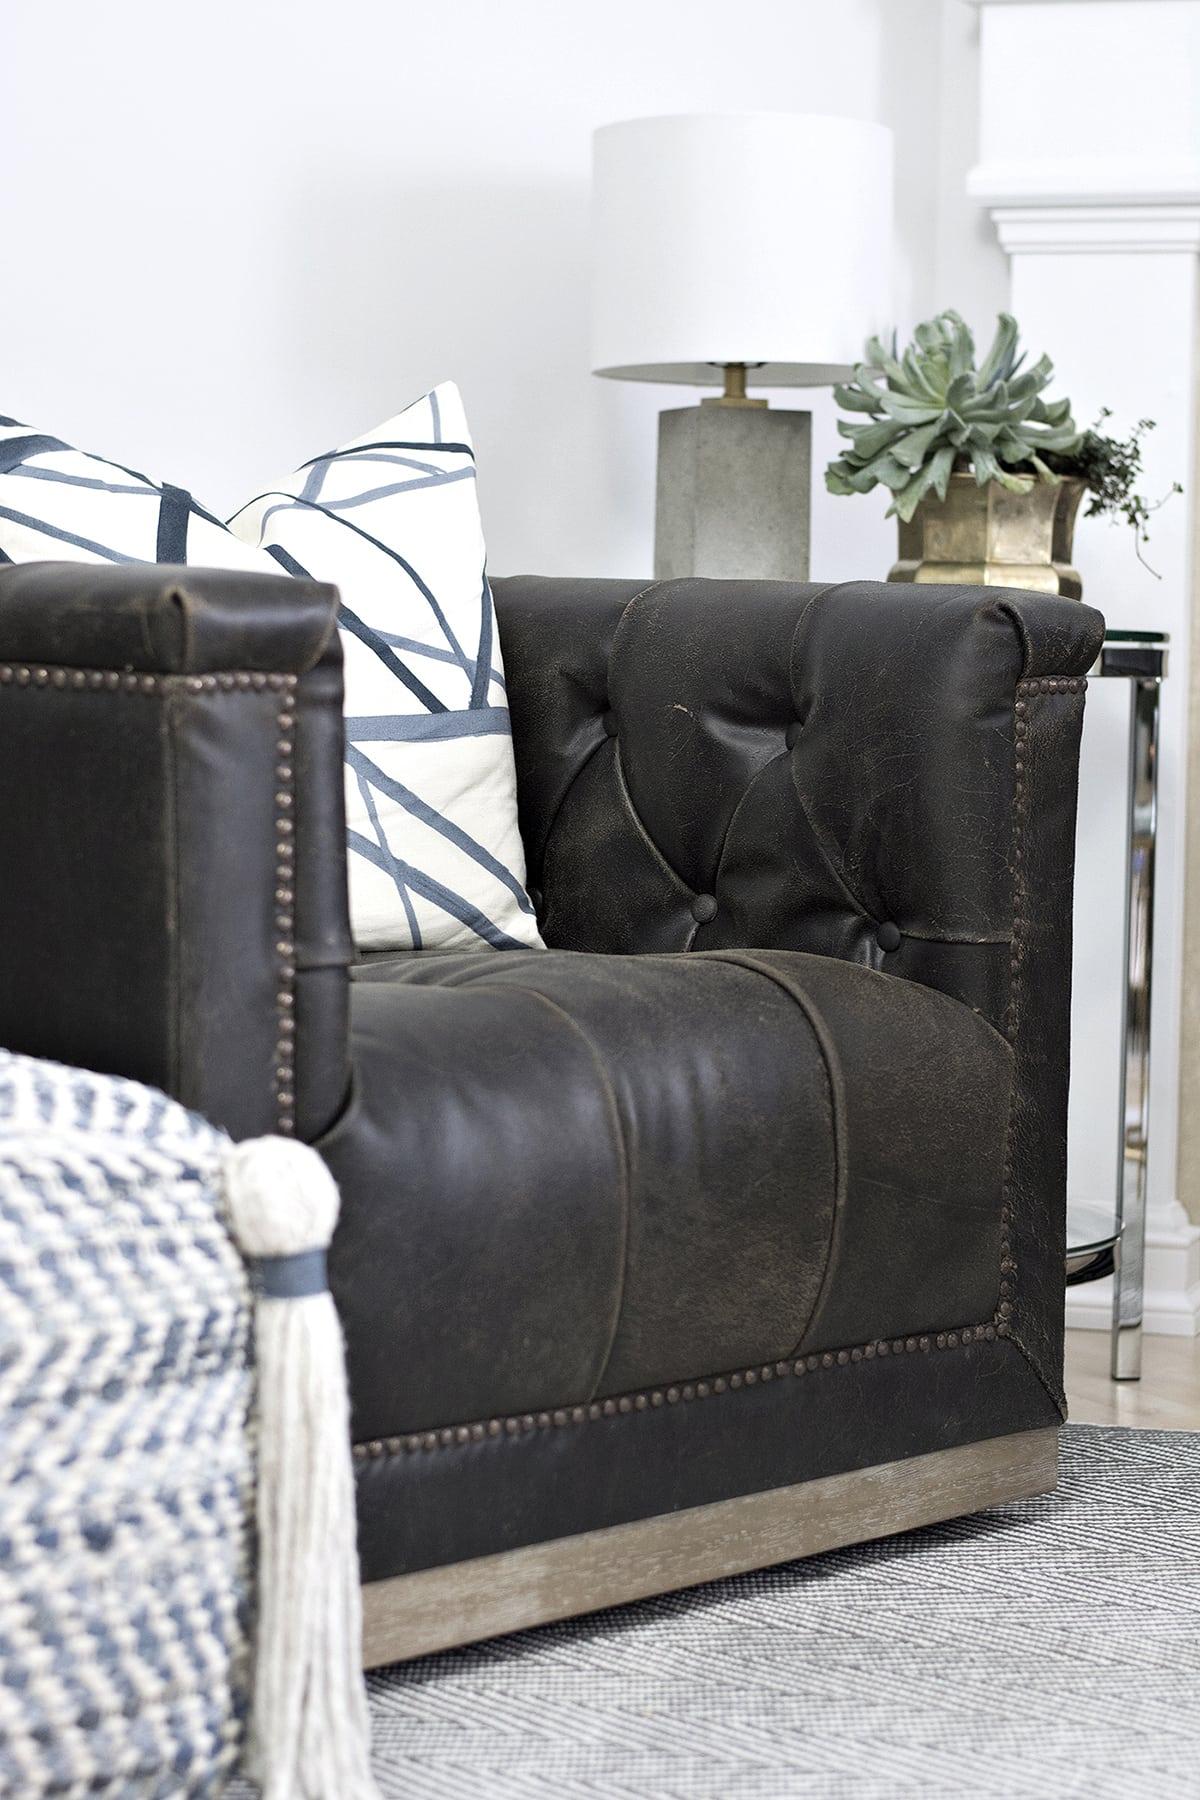 Fireplace Area Makeover Reveal Cuckoo4Design